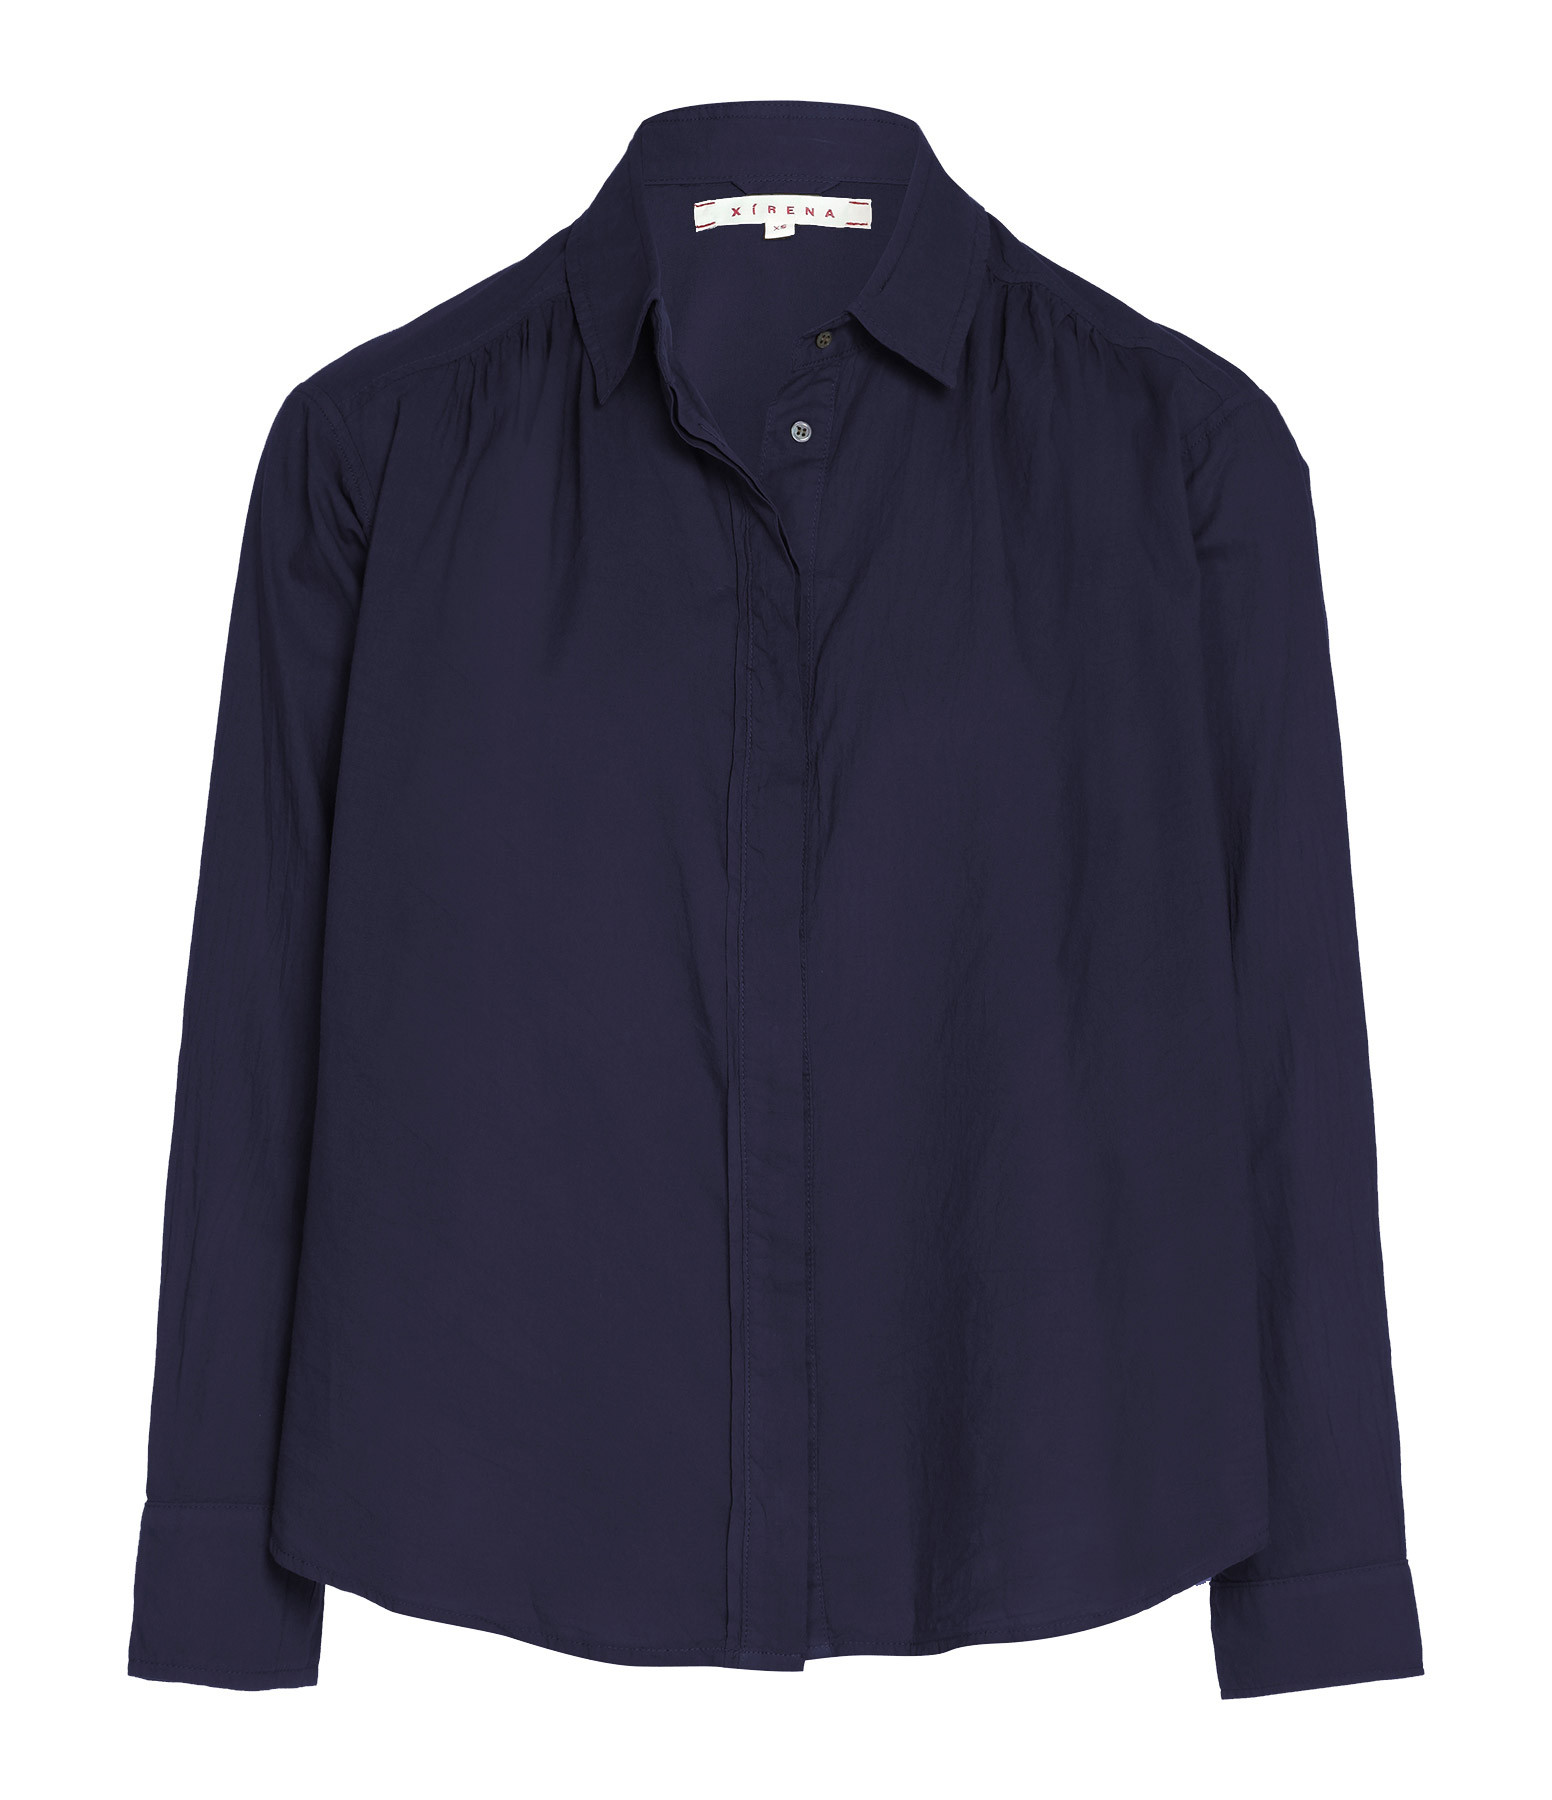 XIRENA - Chemise Beckett Bleu Caban